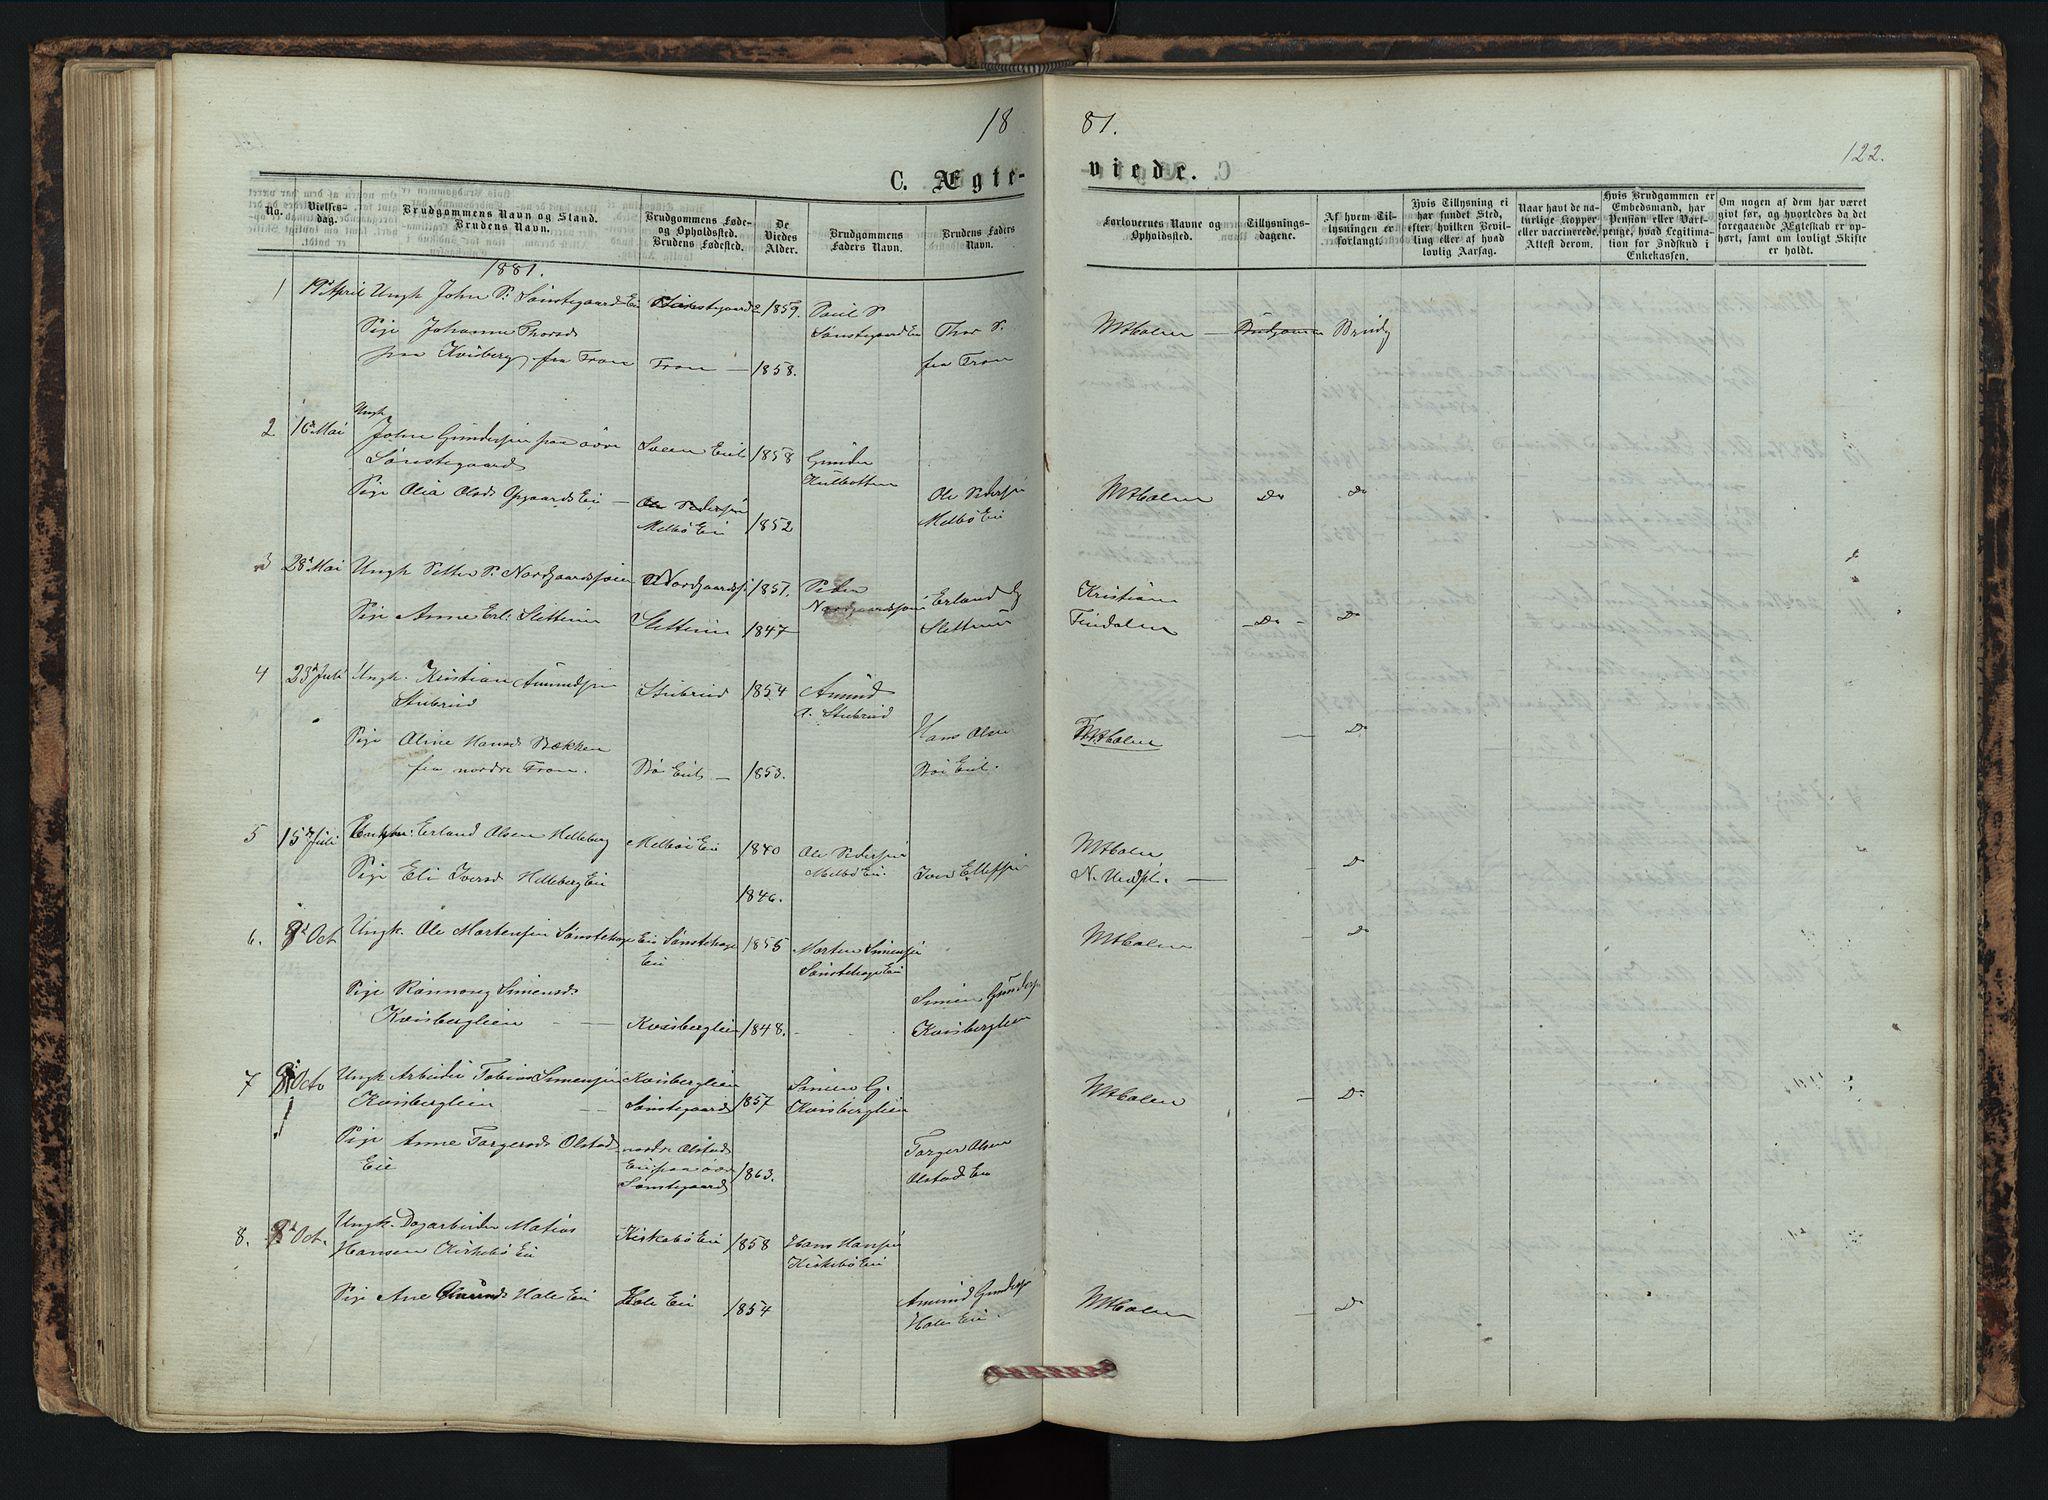 SAH, Vestre Gausdal prestekontor, Klokkerbok nr. 2, 1874-1897, s. 122